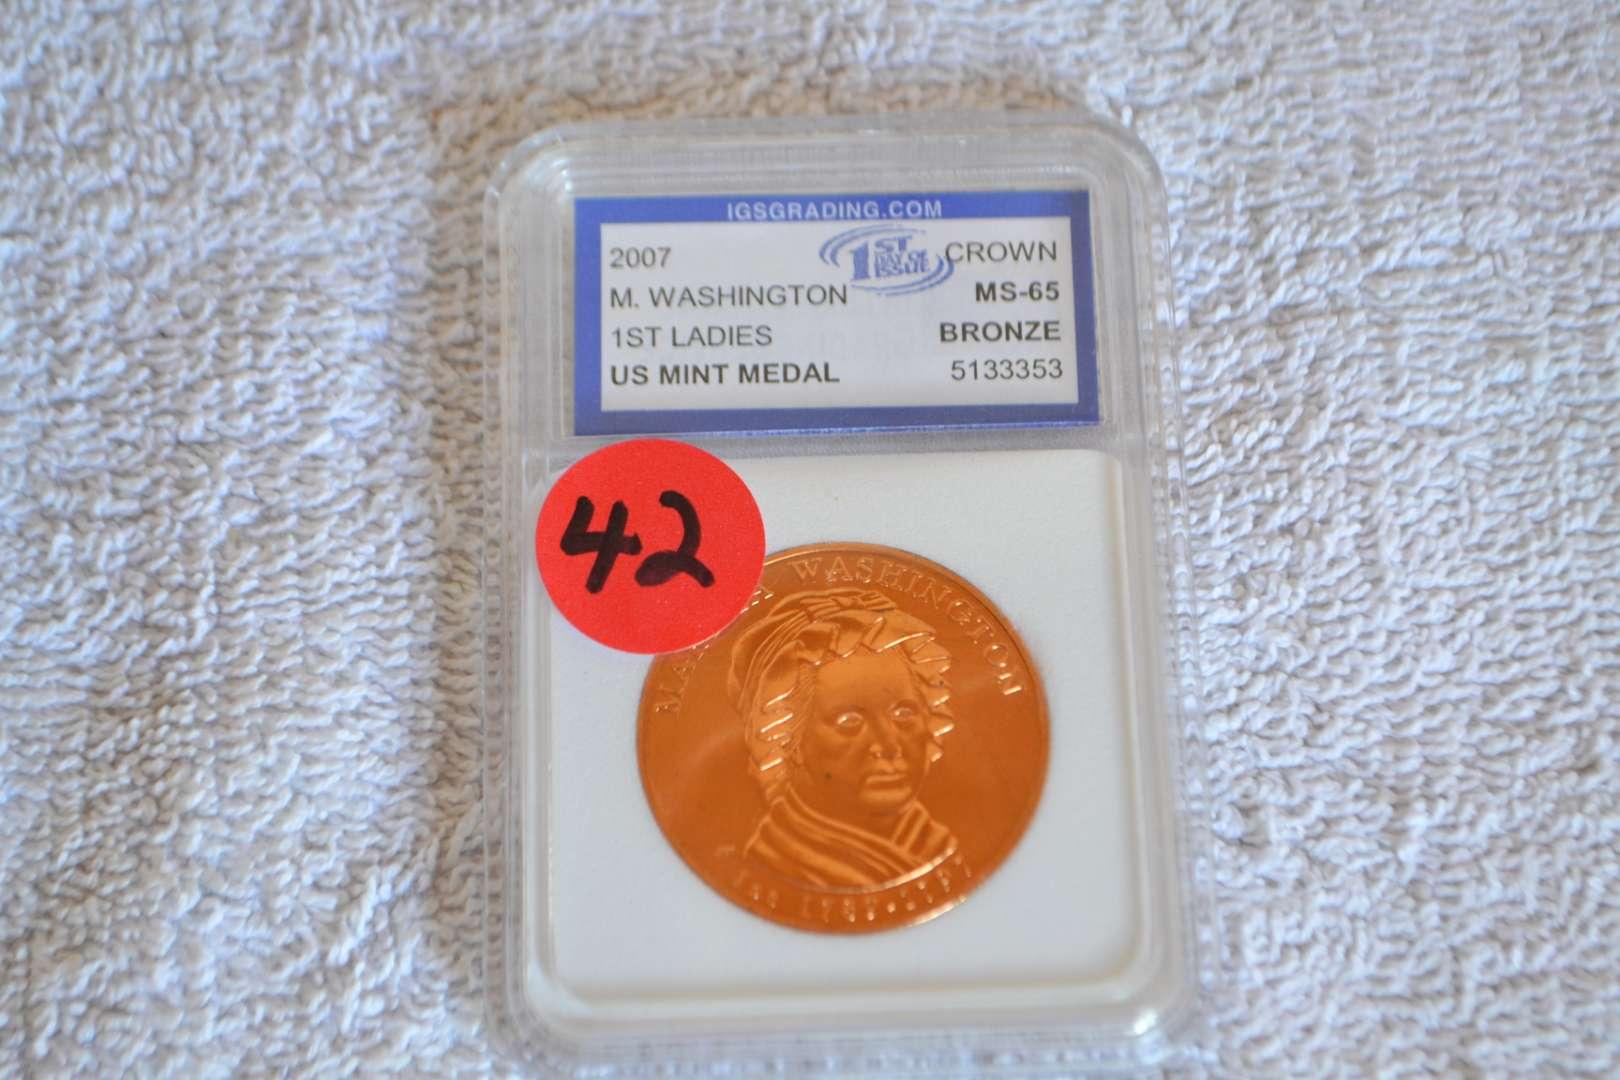 Lot # 42 2007 M. WASHINGTON 1ST LADIES US MINT BRONZE MEDAL IGS GRADED MS65